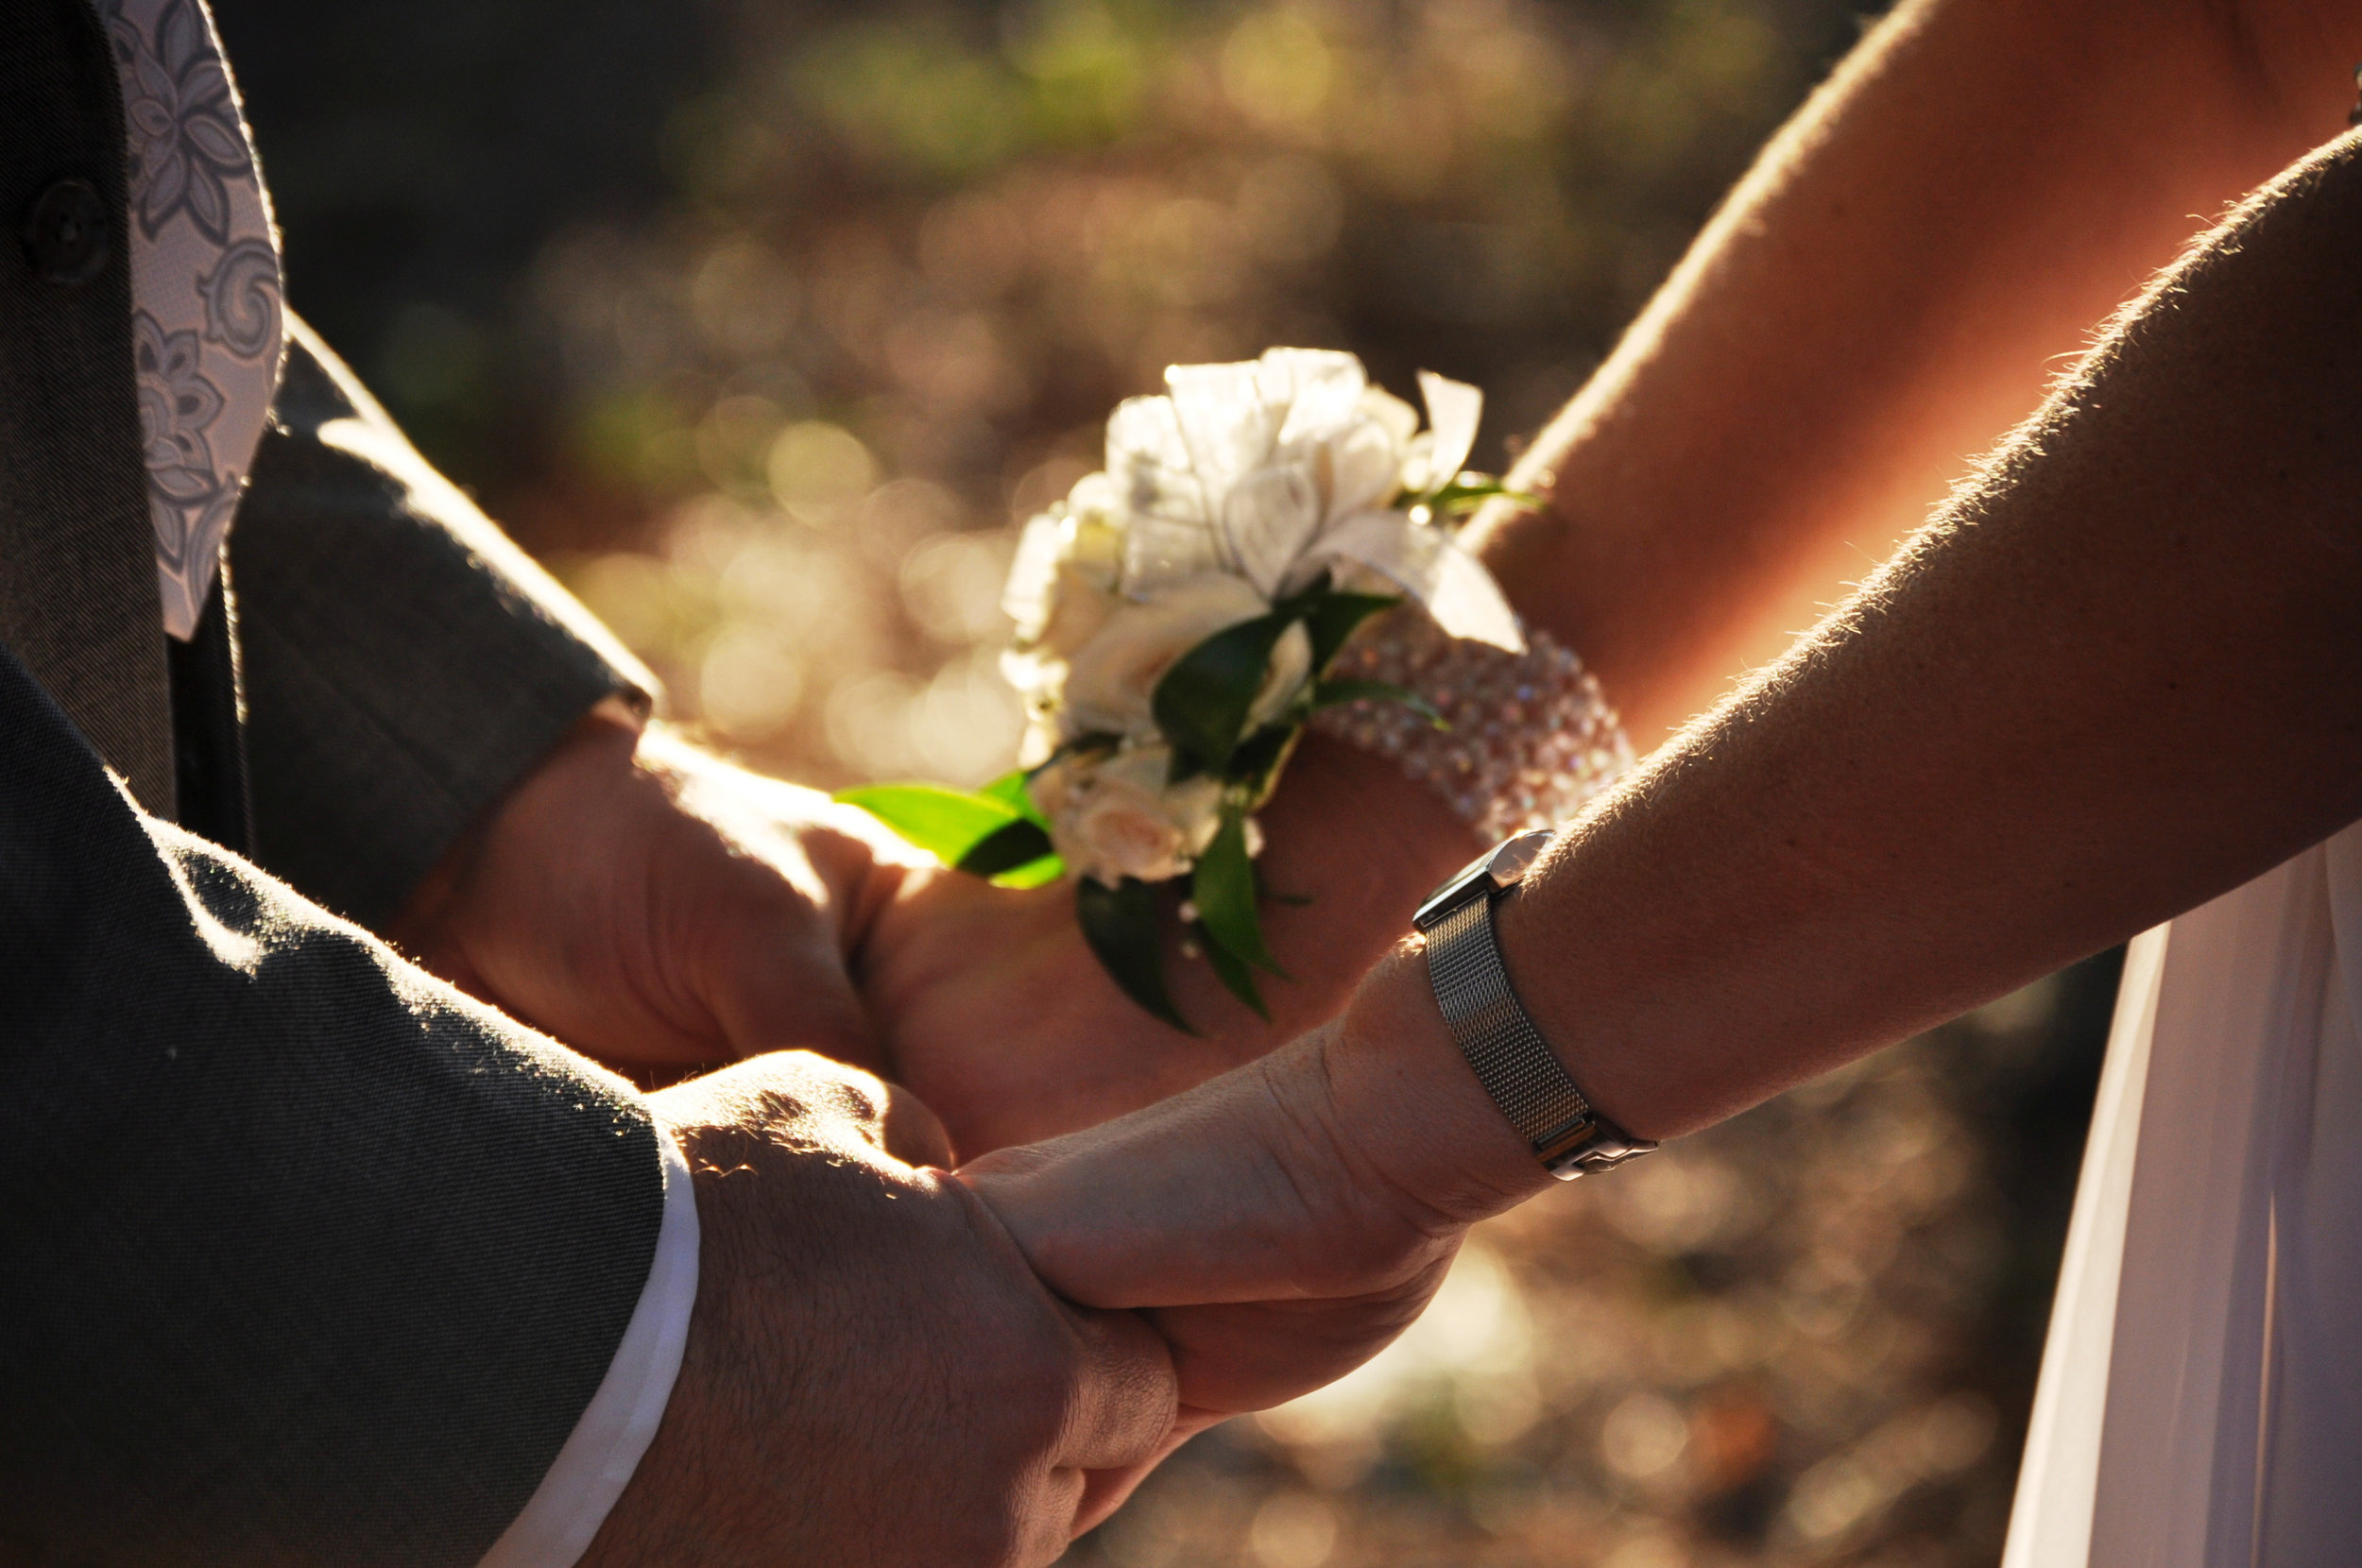 1_111001_Crystal and Paul's Wedding 244.jpg